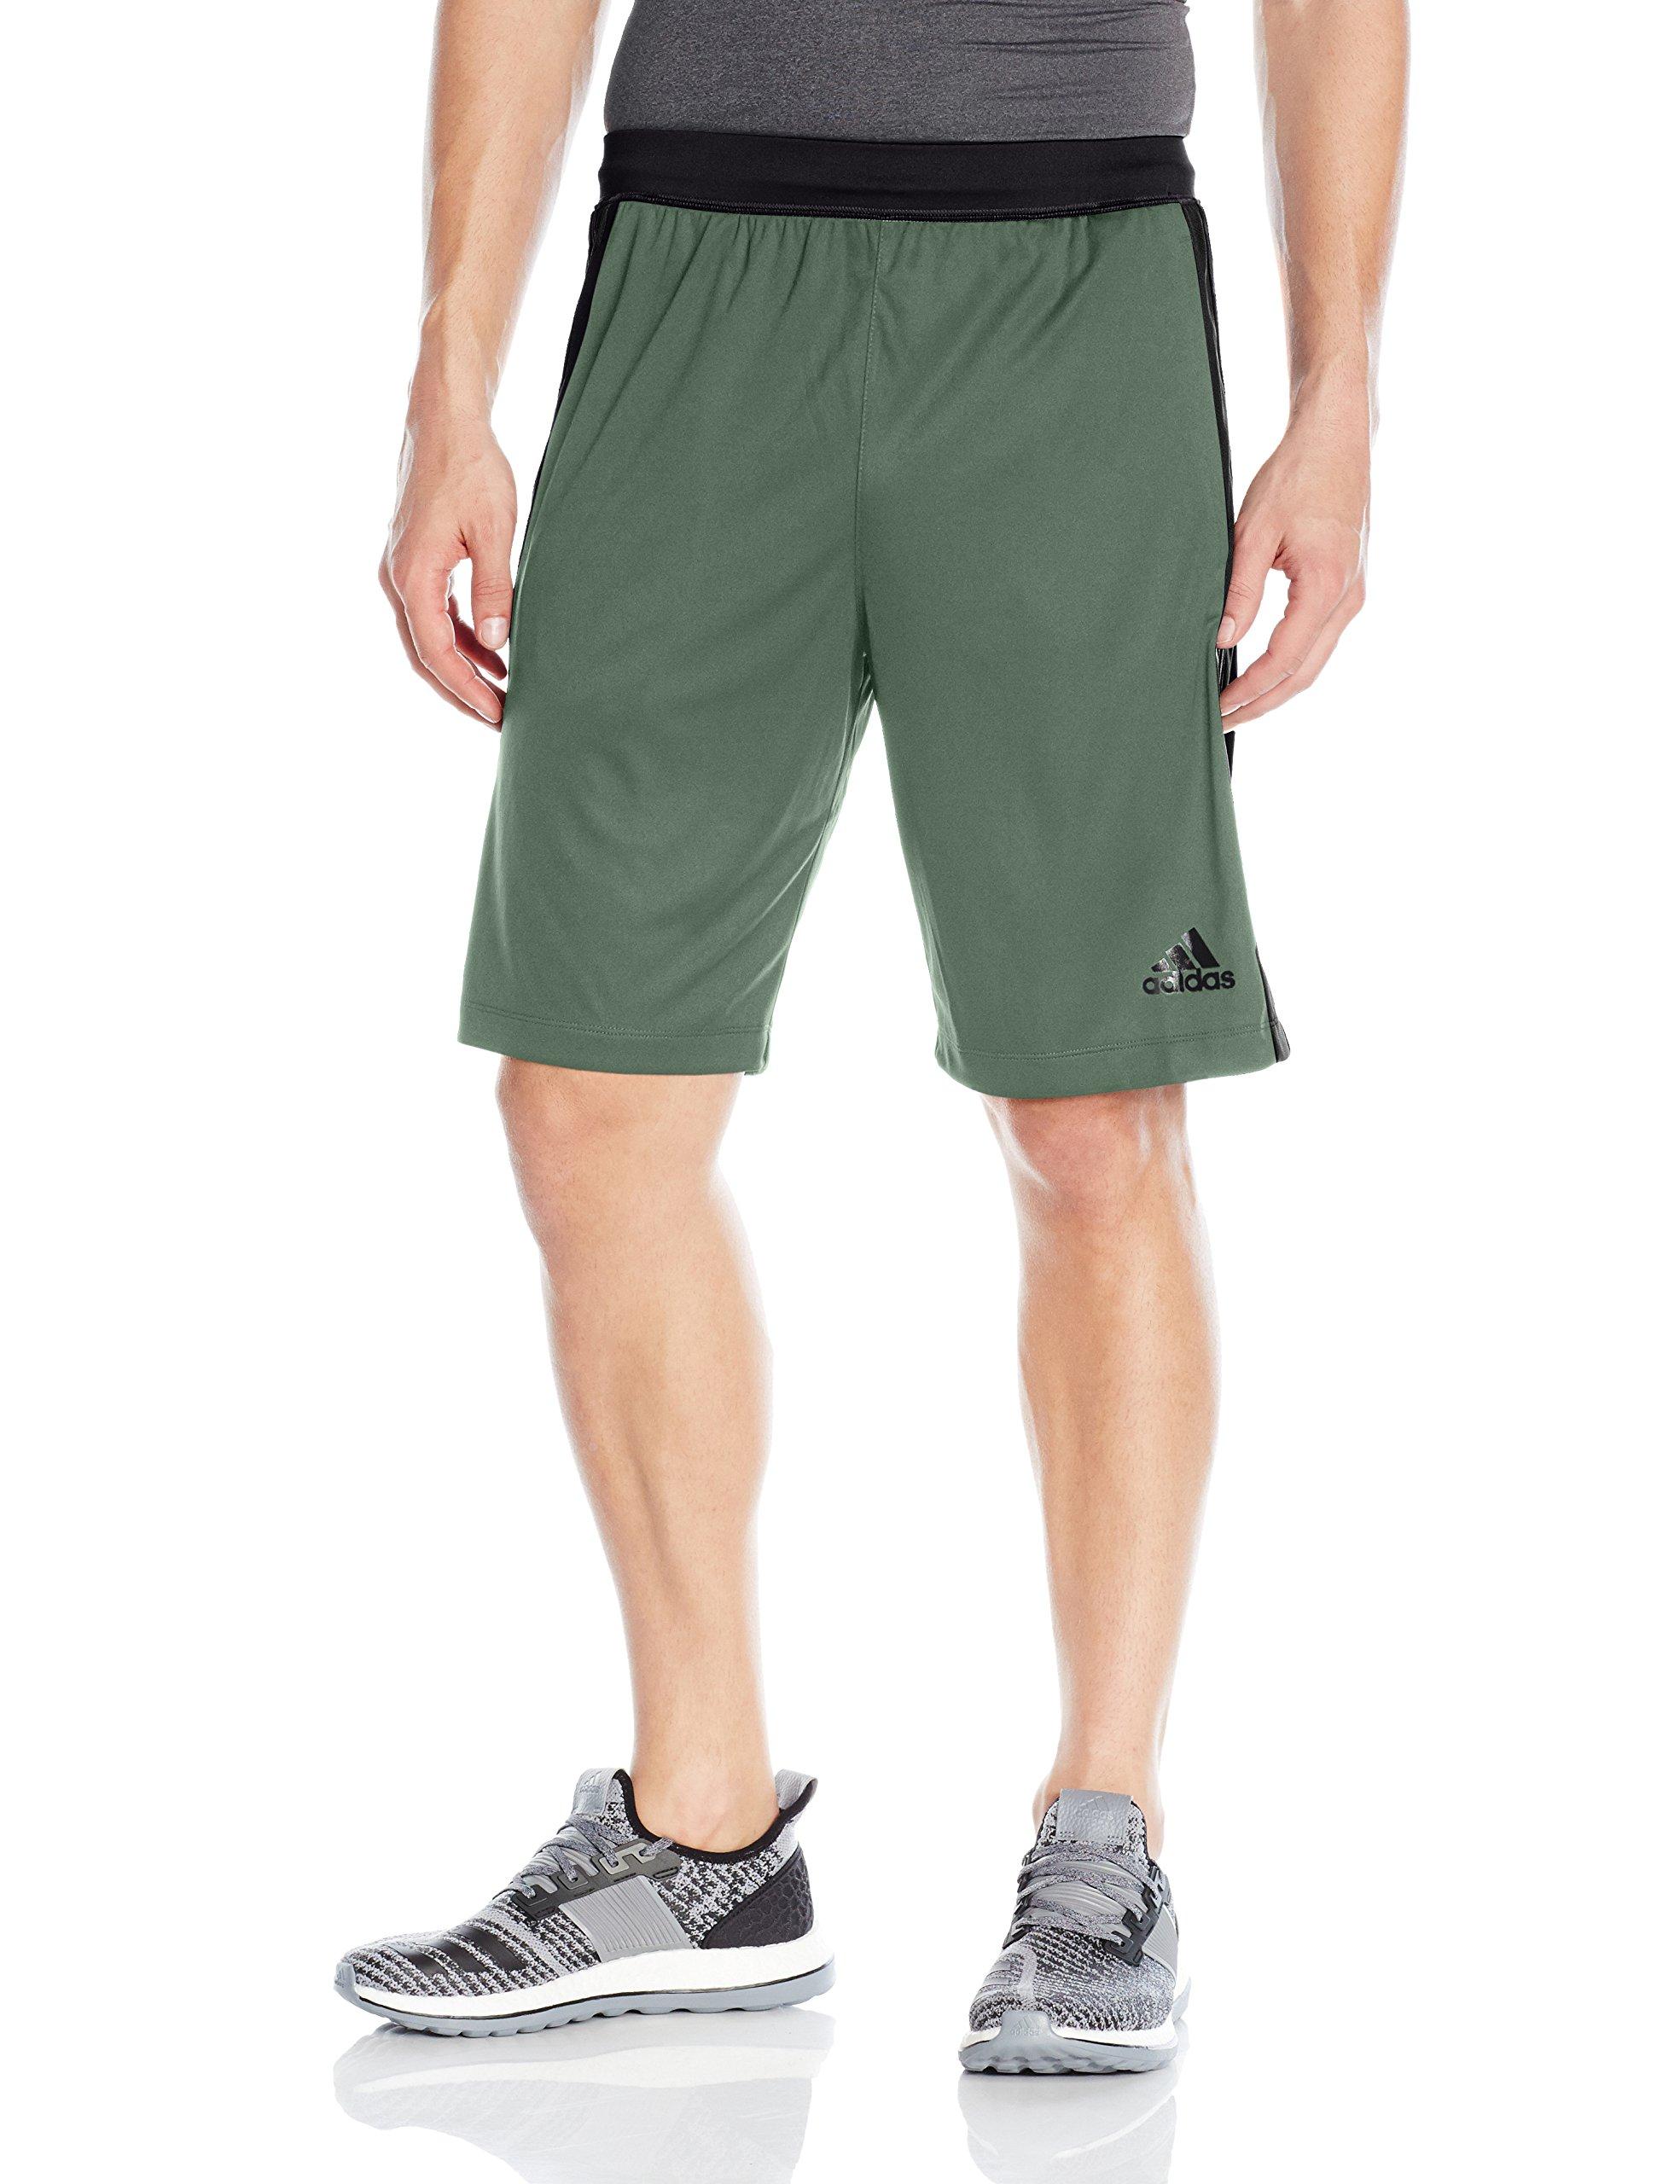 adidas Men's Designed-2-Move 3-Stripe Shorts, Trace